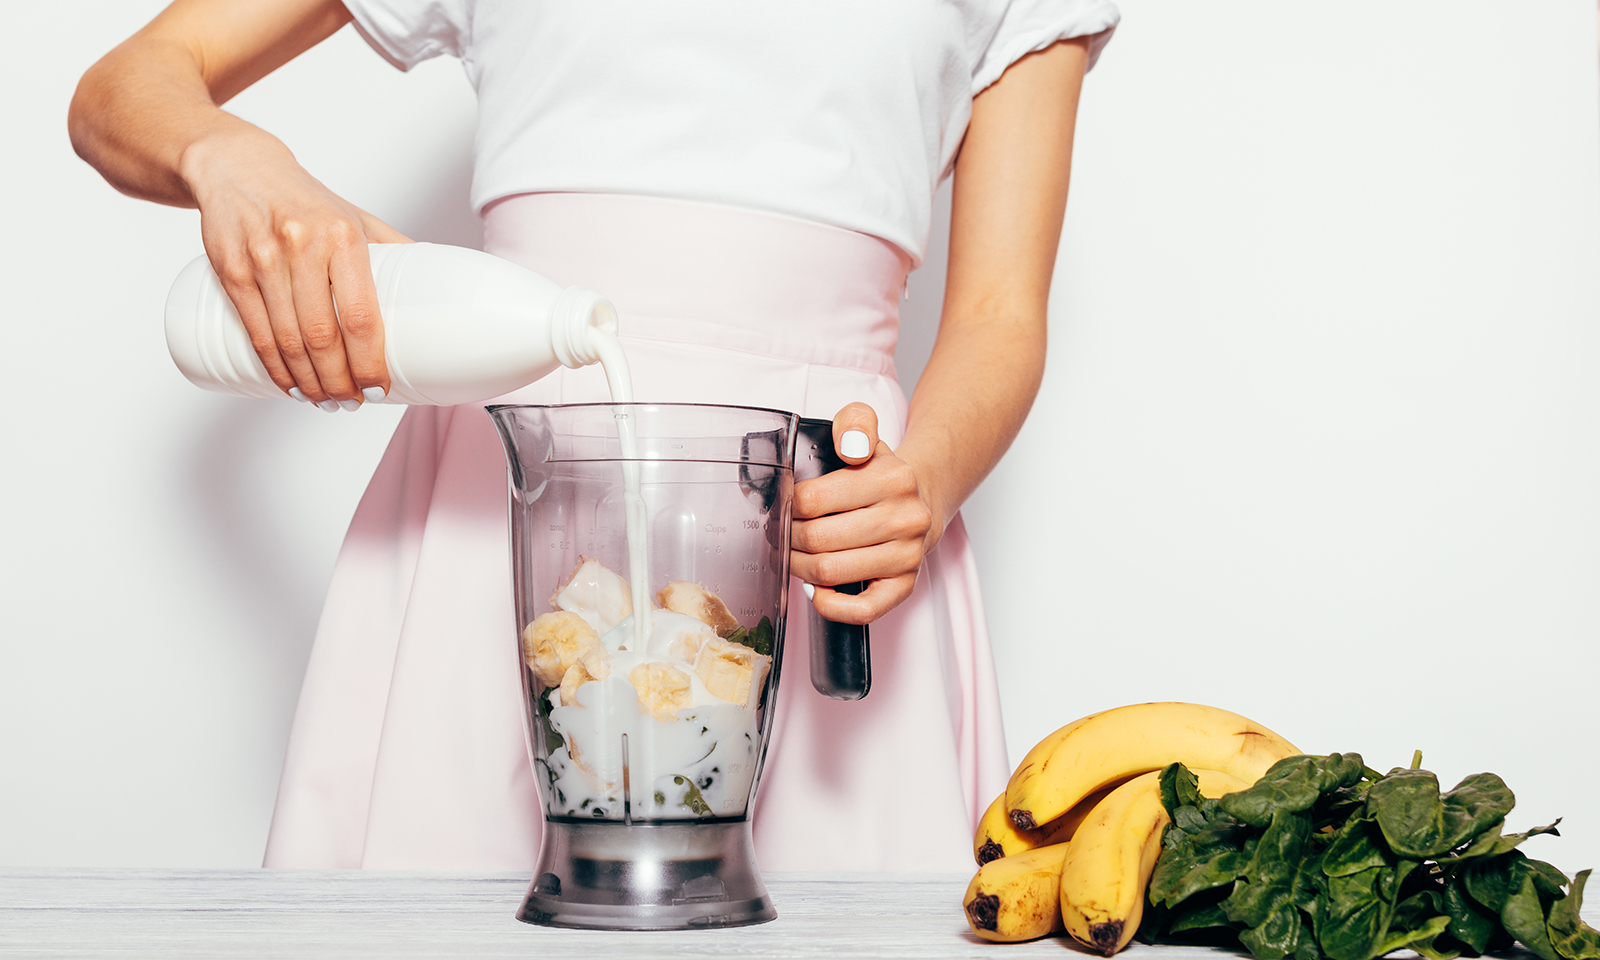 stop-sucking-tits-cows-milk-vegan-milk-options-main-image